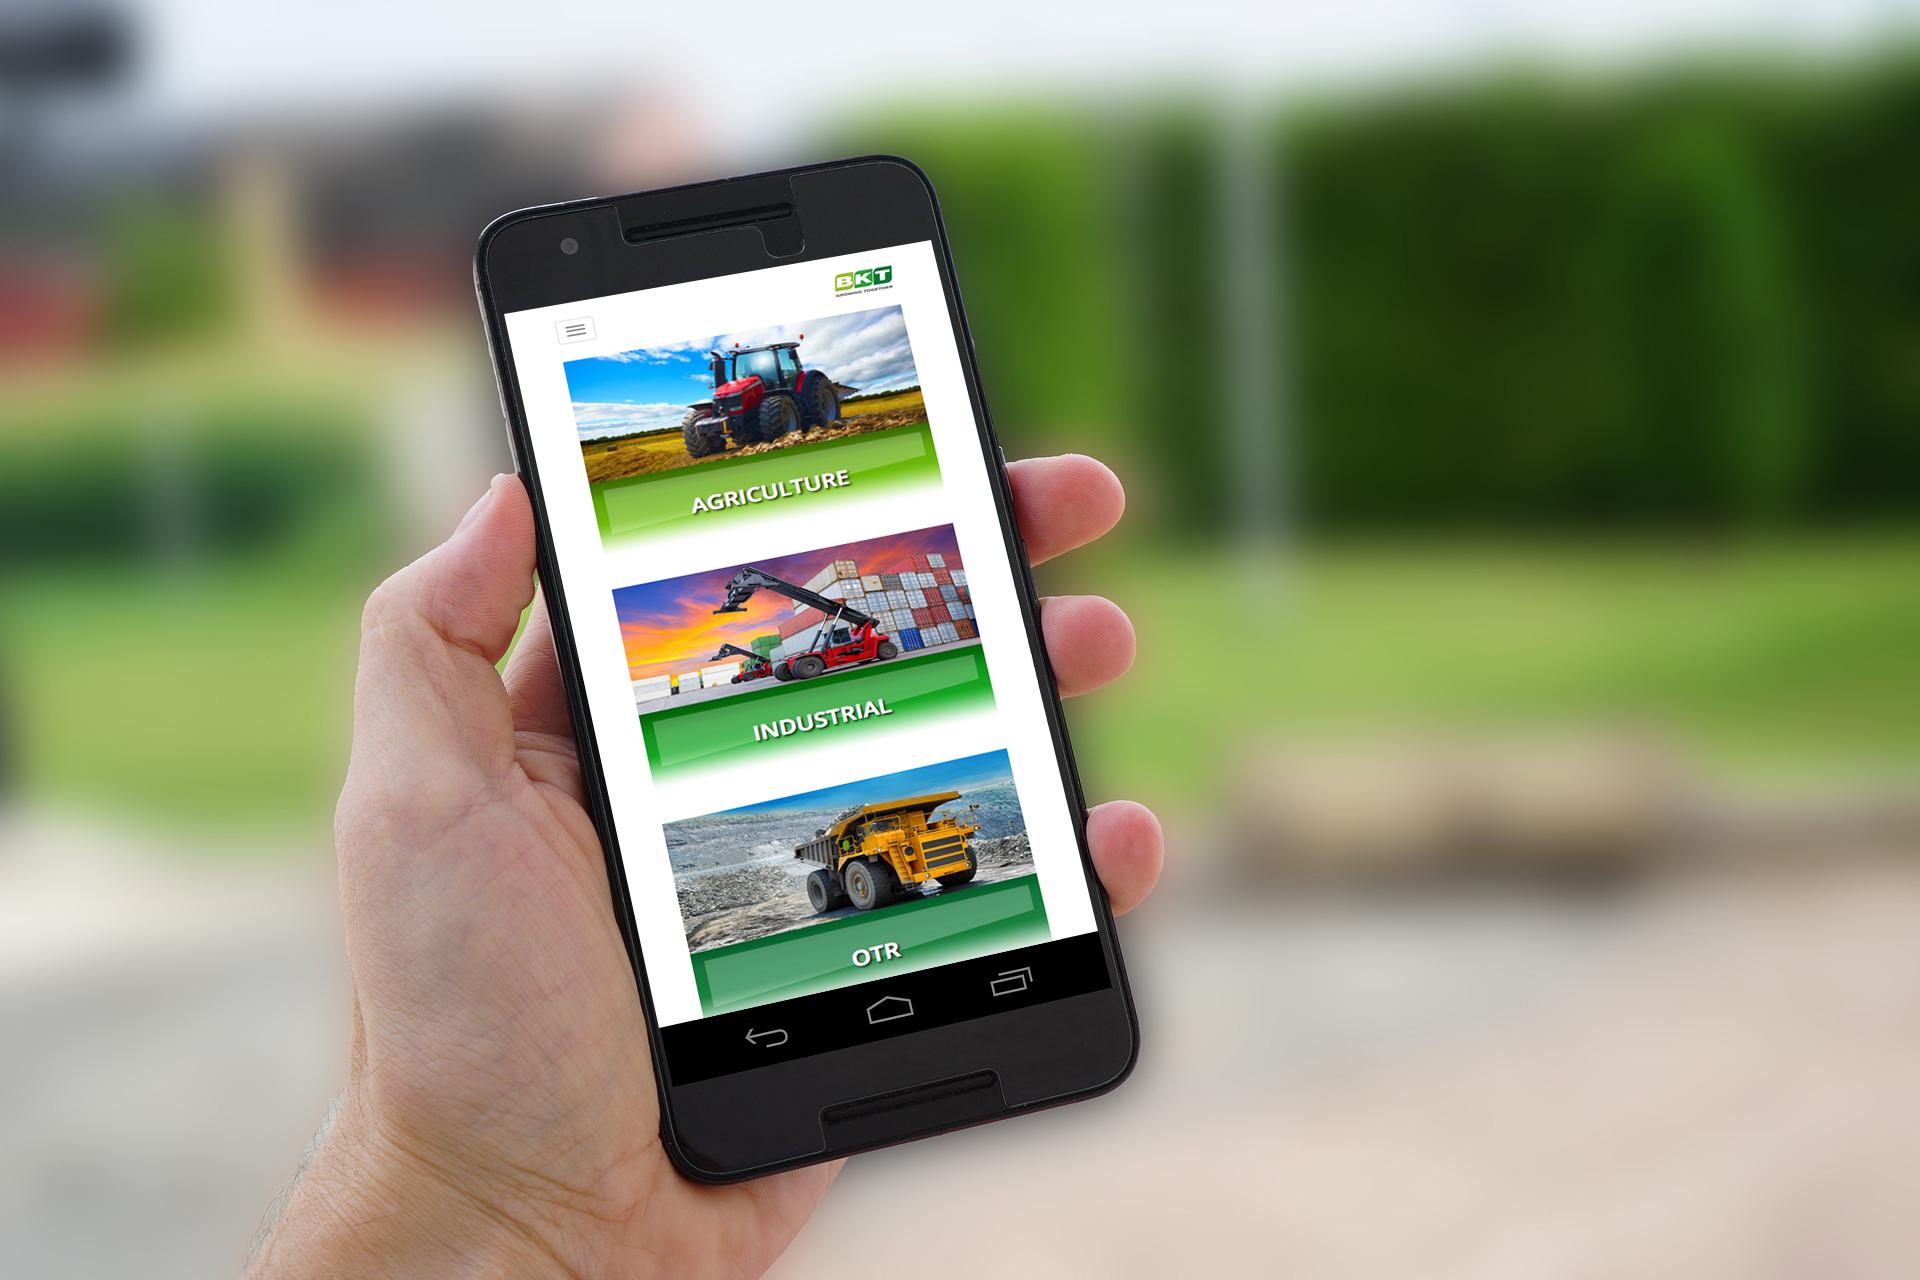 Bkt sitomobile agricoltura news for Sito mobili